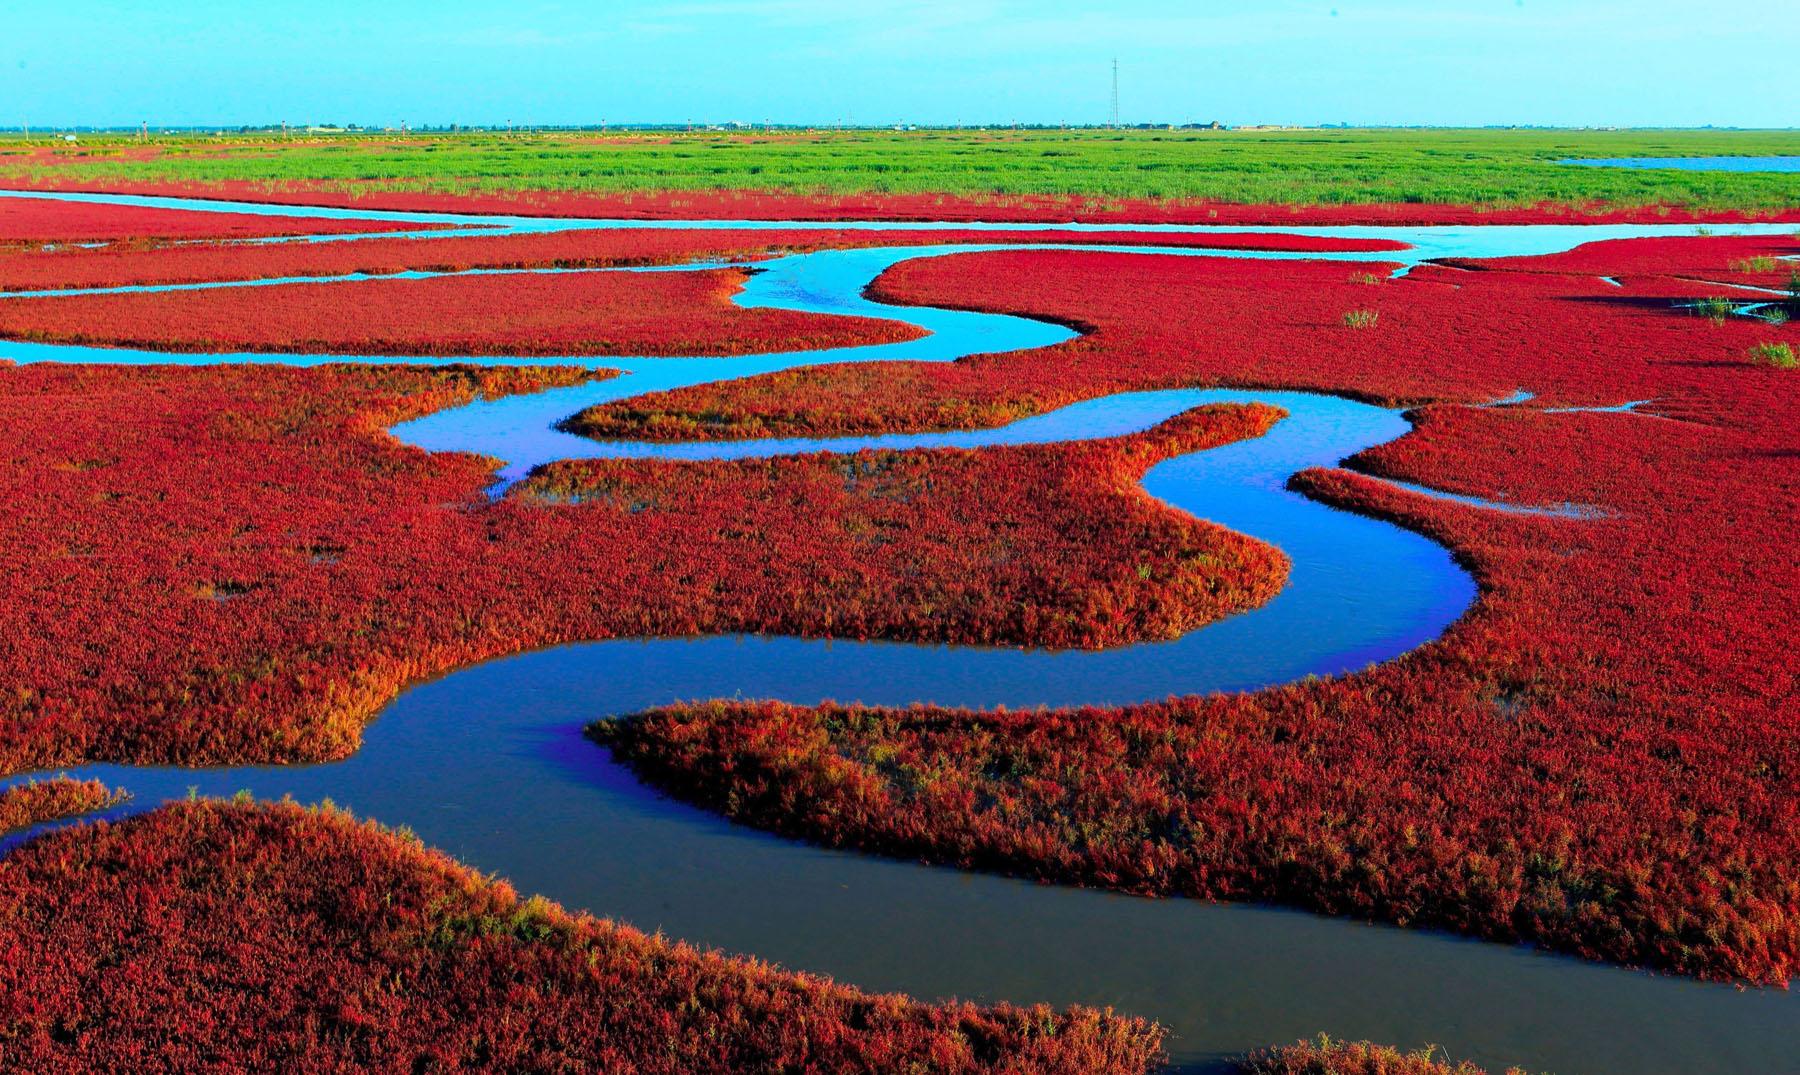 Panjin La Playa Del Mar Rojo El Viajero Feliz